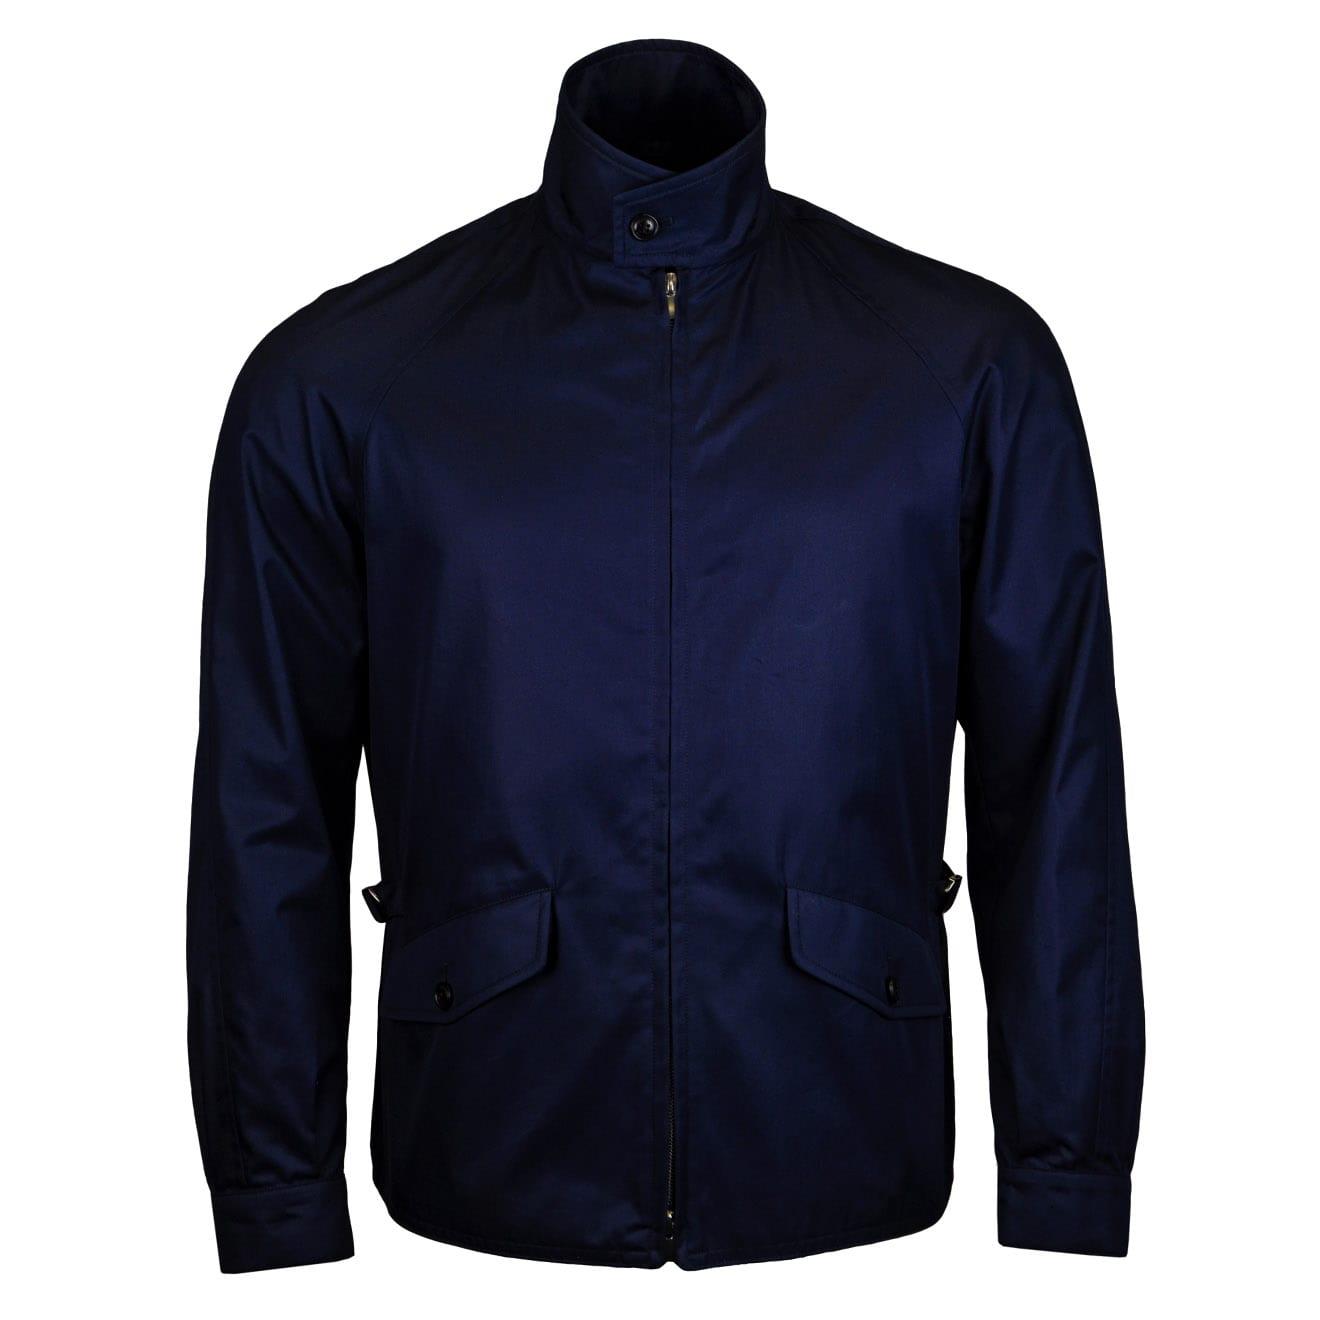 Grenfell Cloth Golfer Jacket French Navy